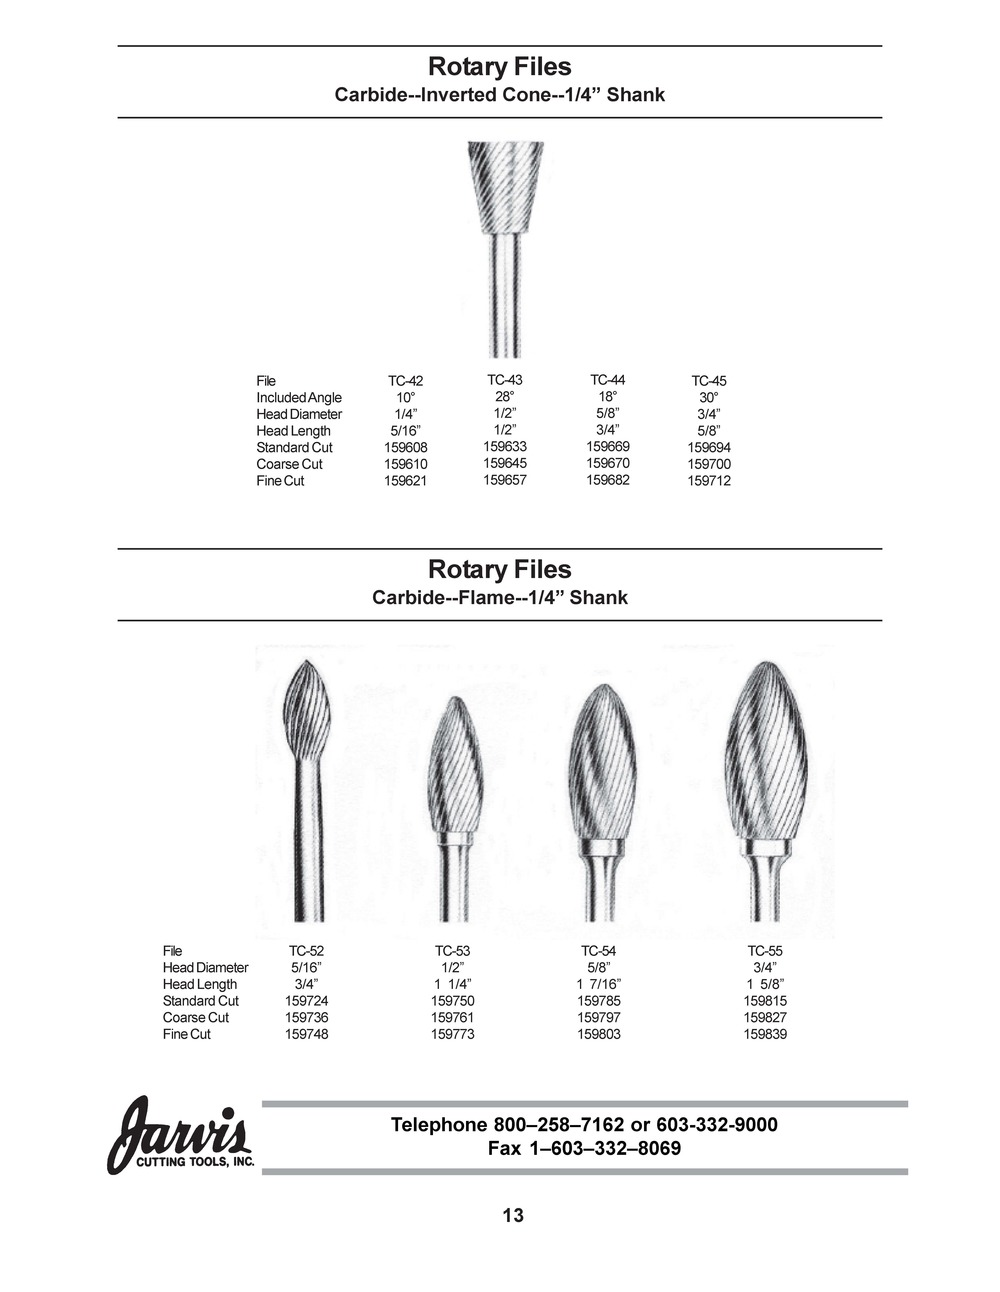 Rotary-Files-Catalog_Page_13.jpg